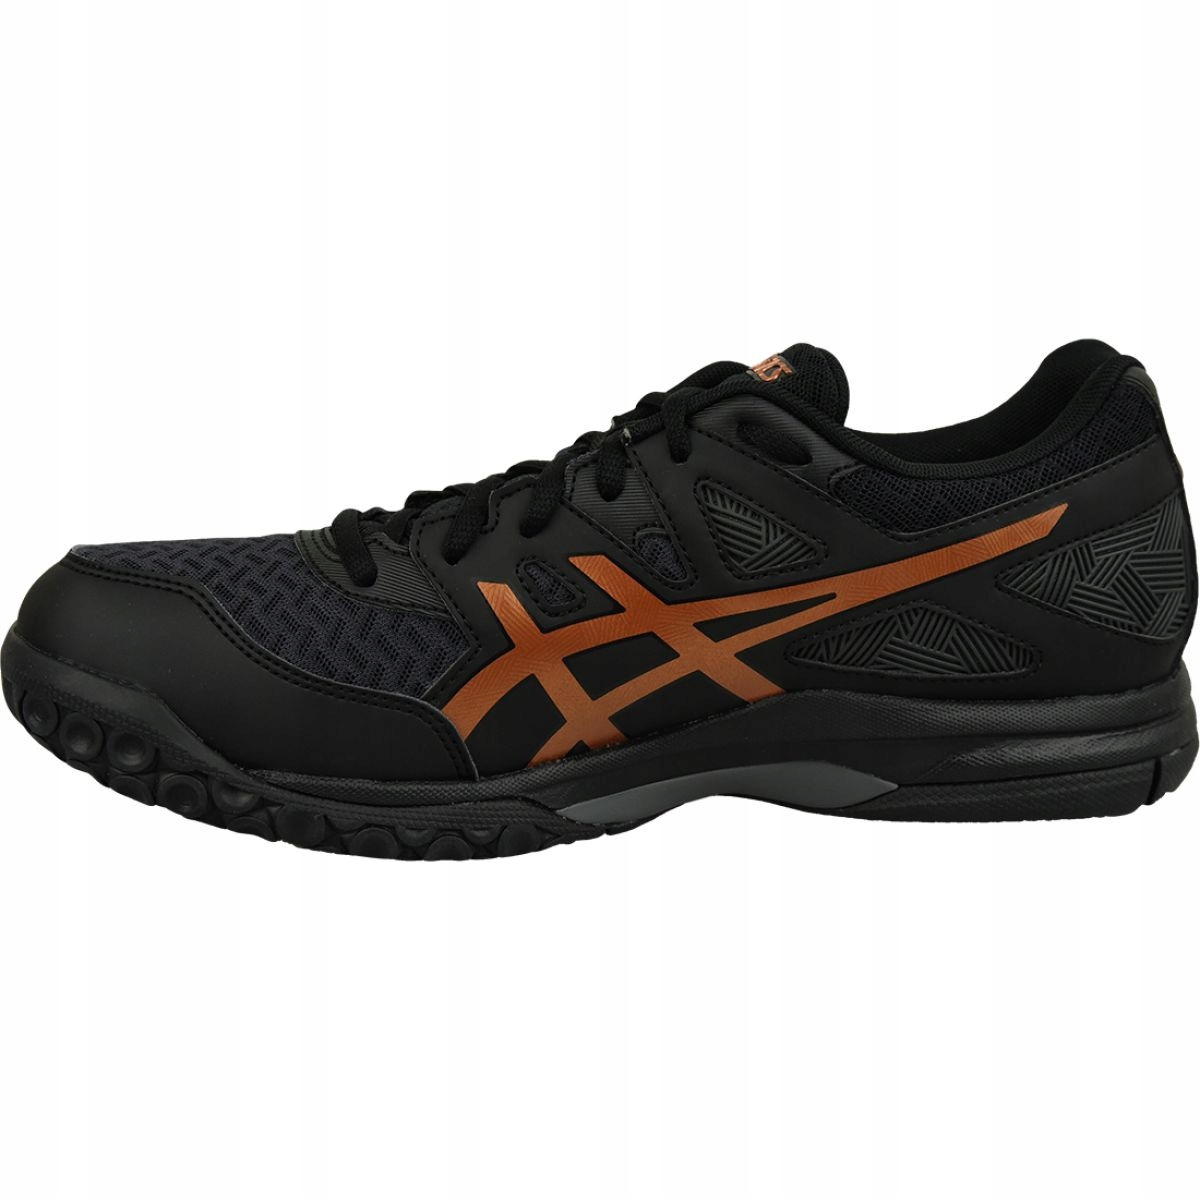 Asics Gel Task 2 M 1071A037-002 black black - KeeShoes